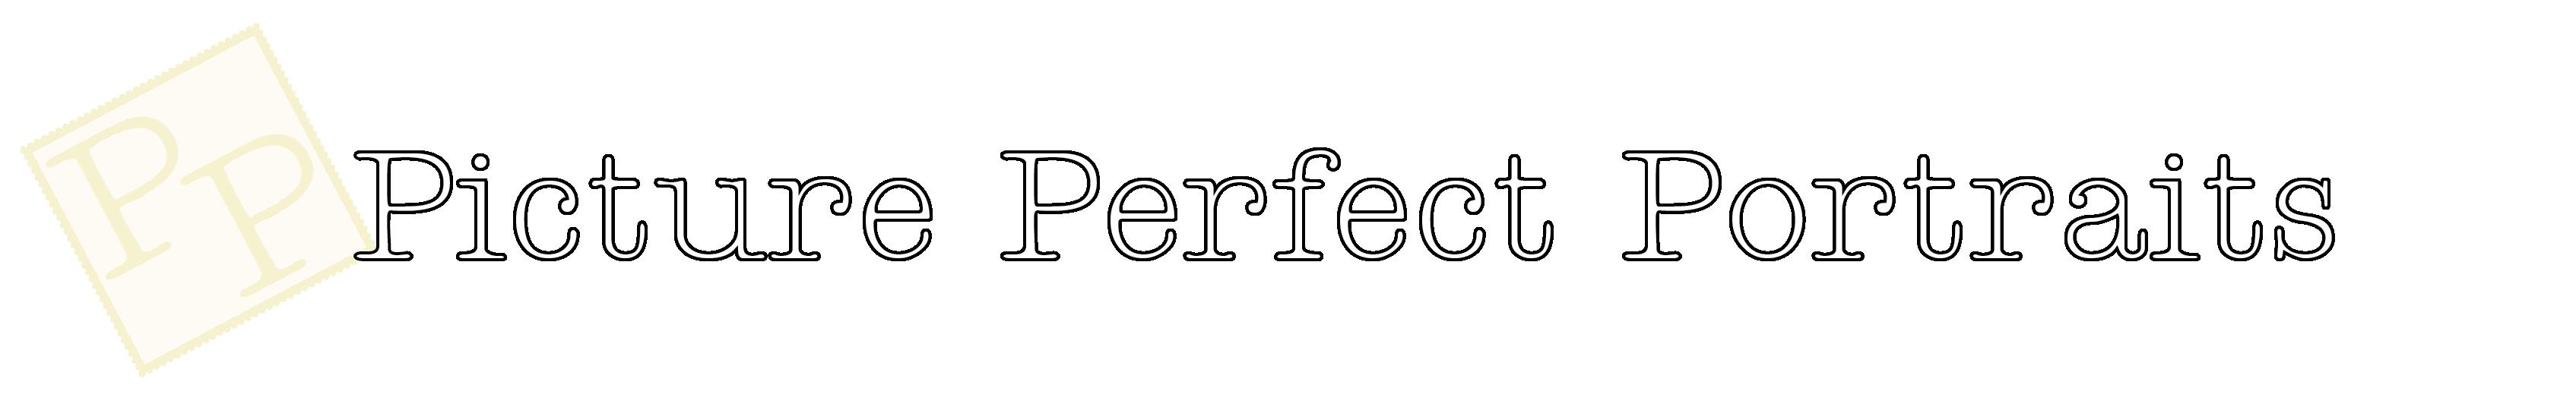 Picture Perfect Portraits